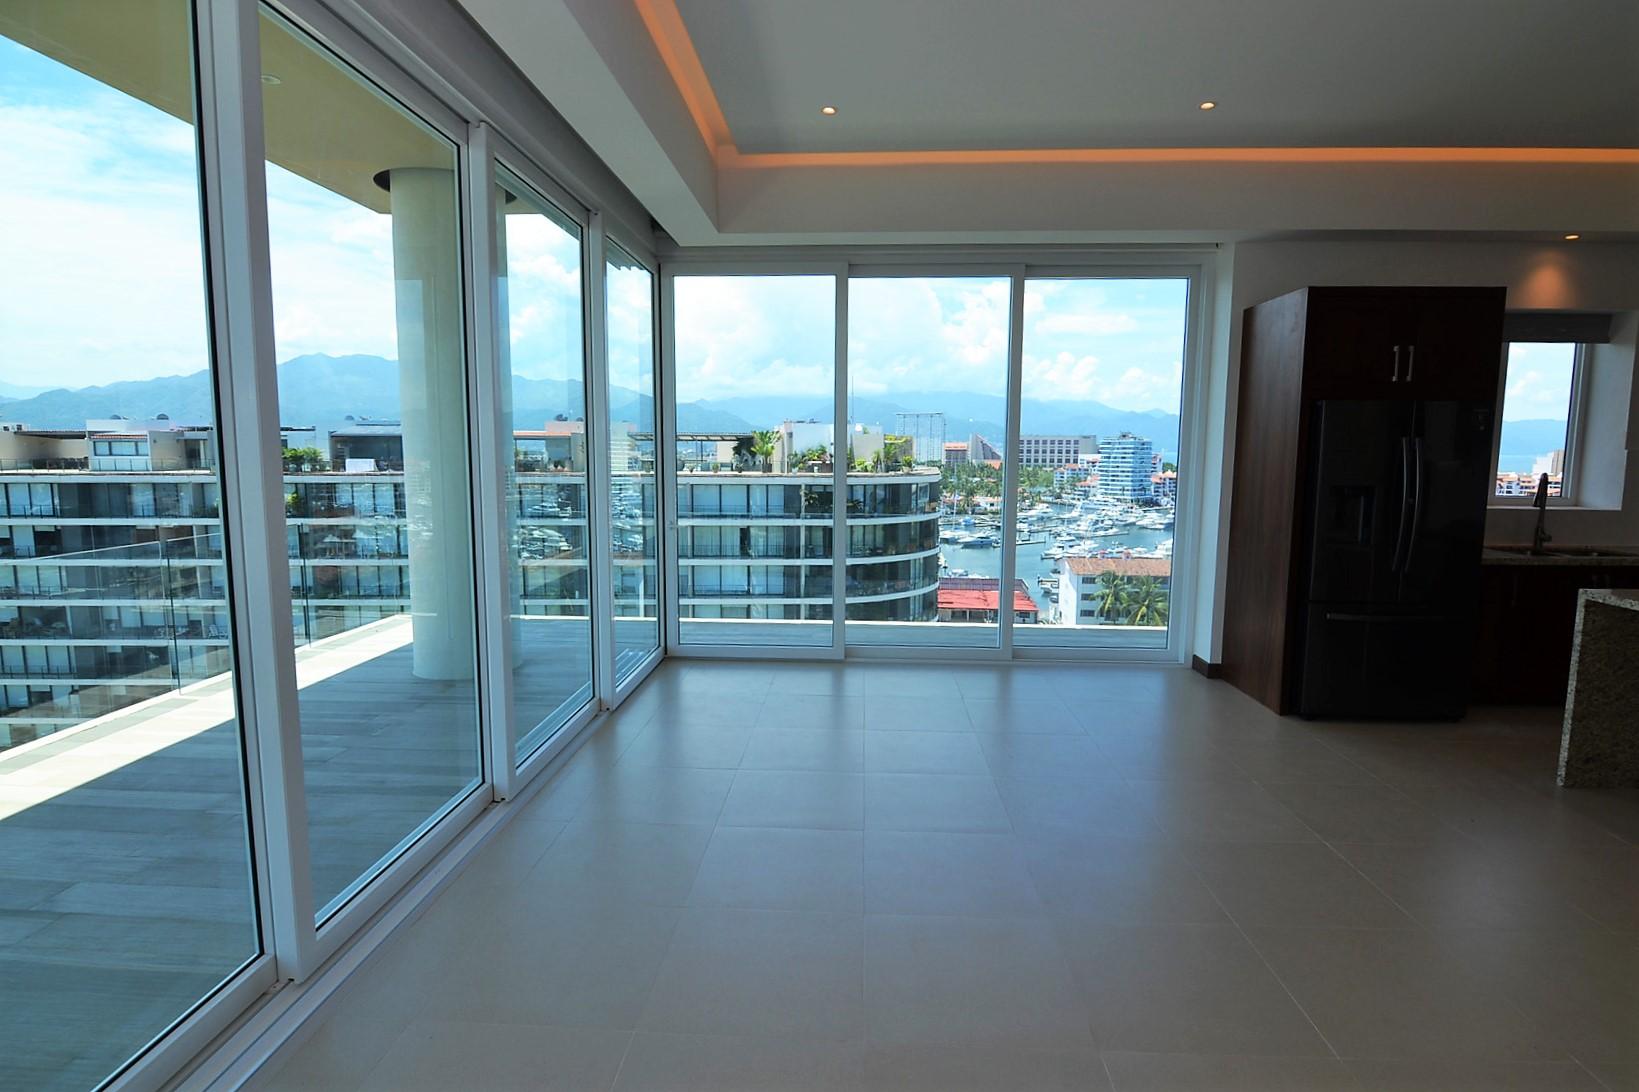 Condo VMarina PH10 - Puerto Vallarta Luxury Condo For Rent (46)